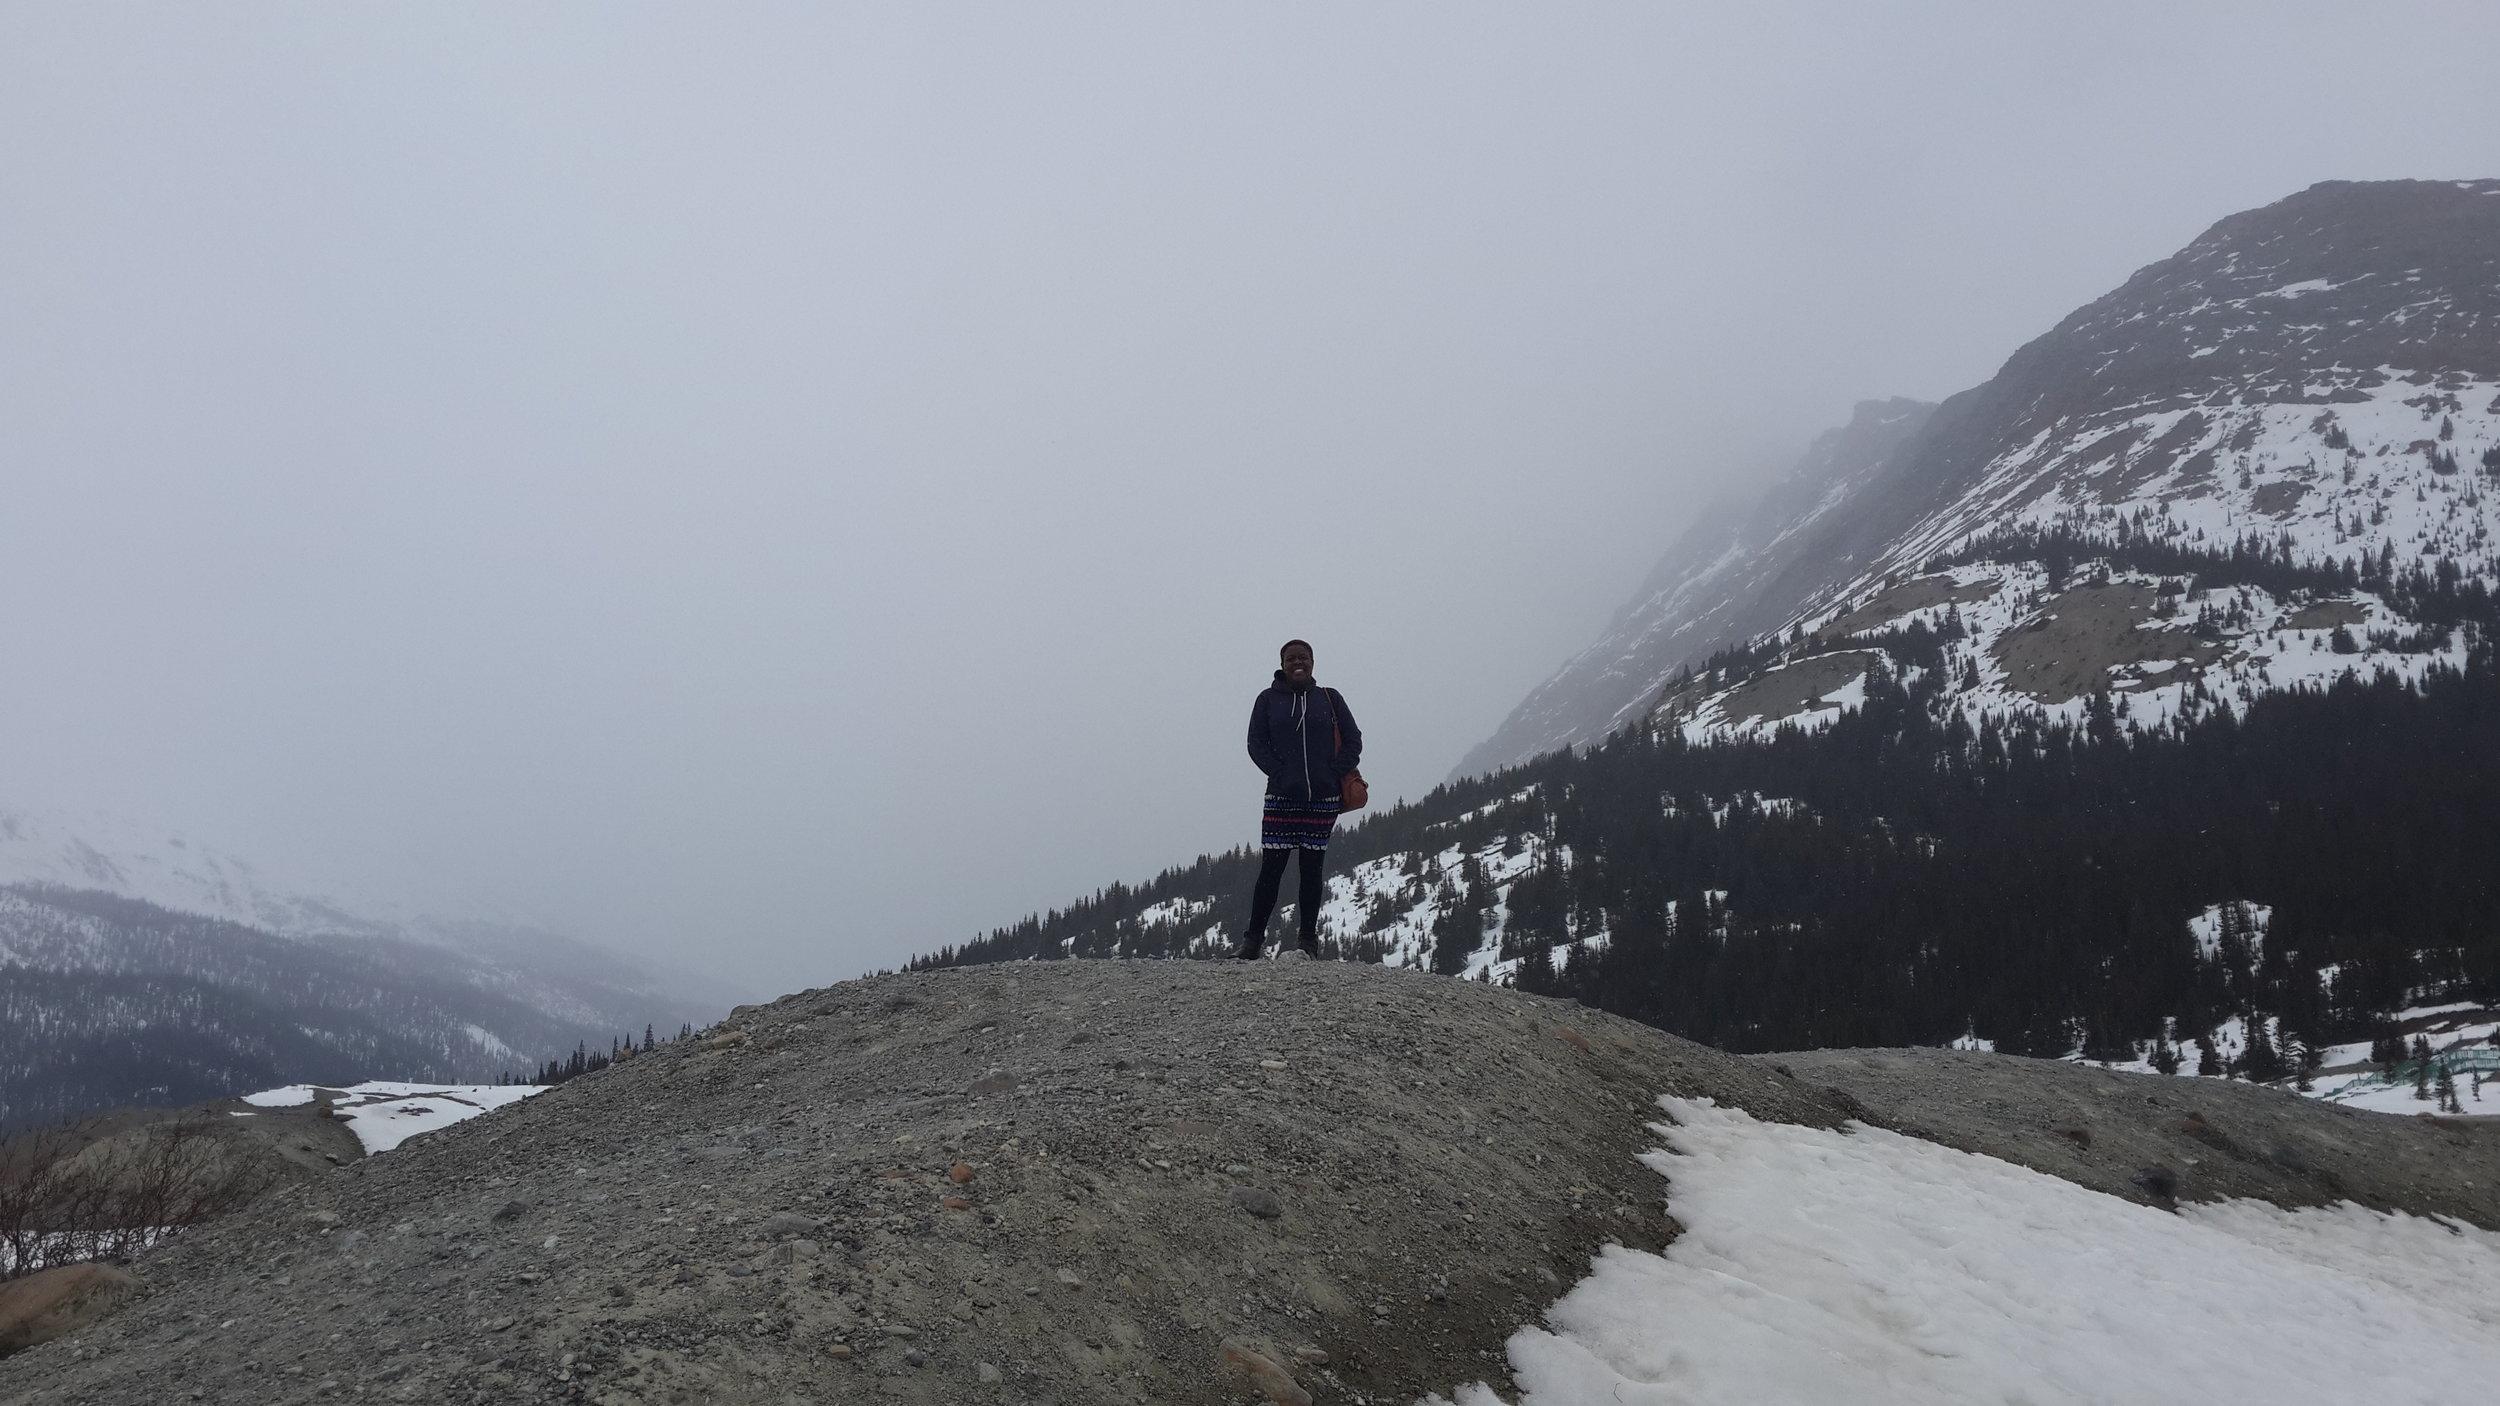 SnowyMountain.jpg